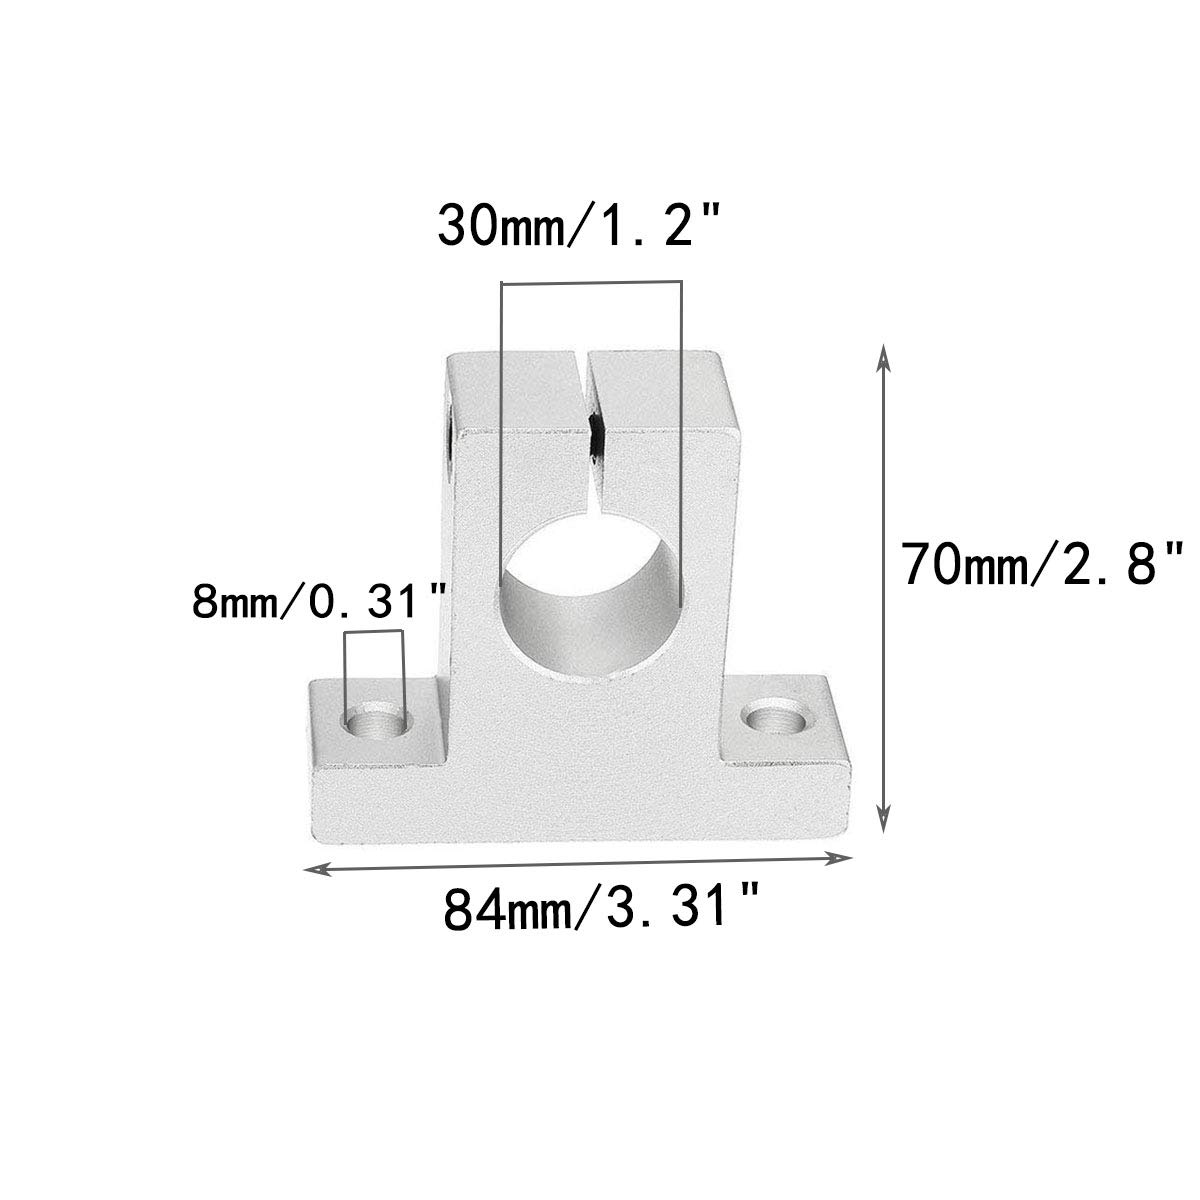 COMOK 2Pcs Aluminum SK30 30mm Inner Dia CNC Linear Motion Ball Slide Units Rail Support Guide Shaft Bearing